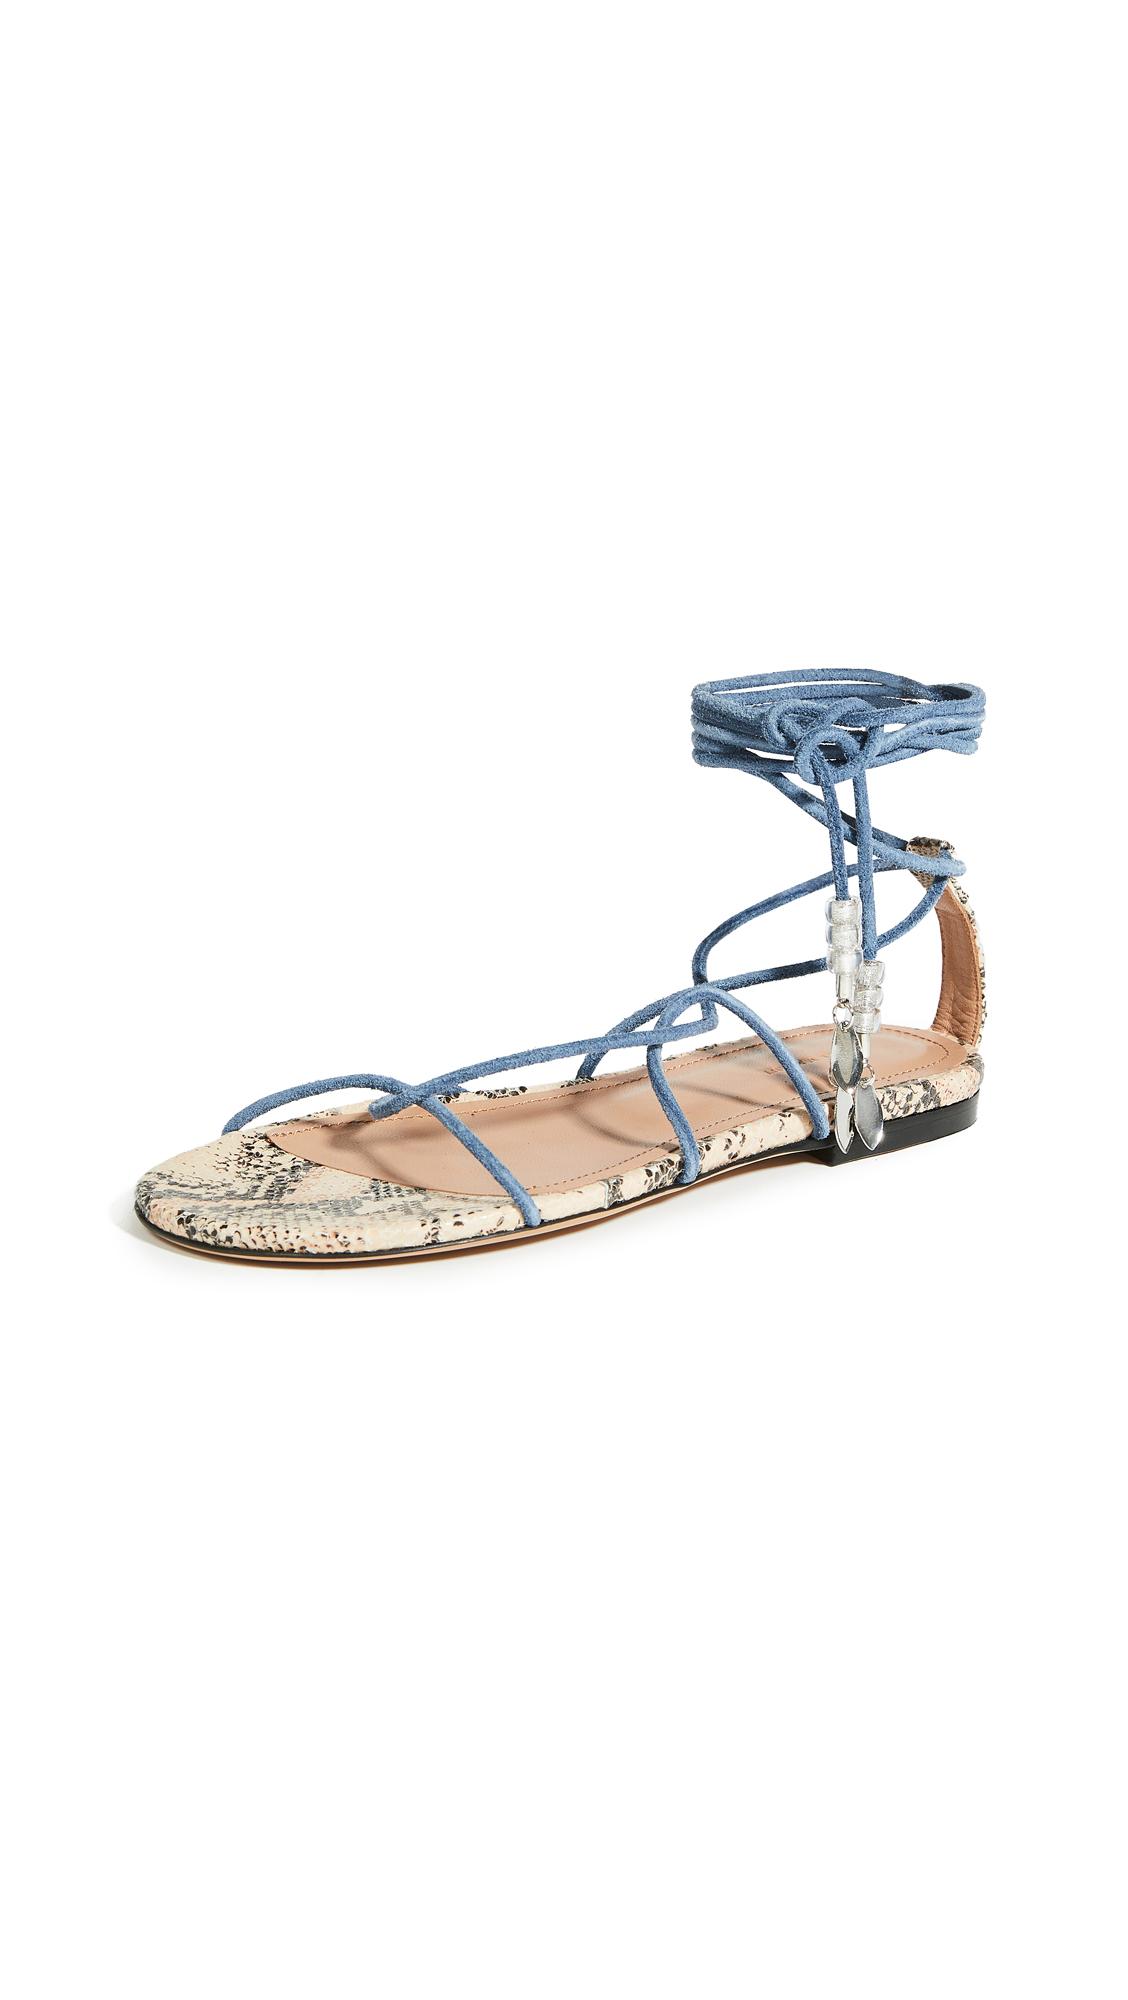 Isabel Marant Jindia Flat Strappy Sandals - 40% Off Sale